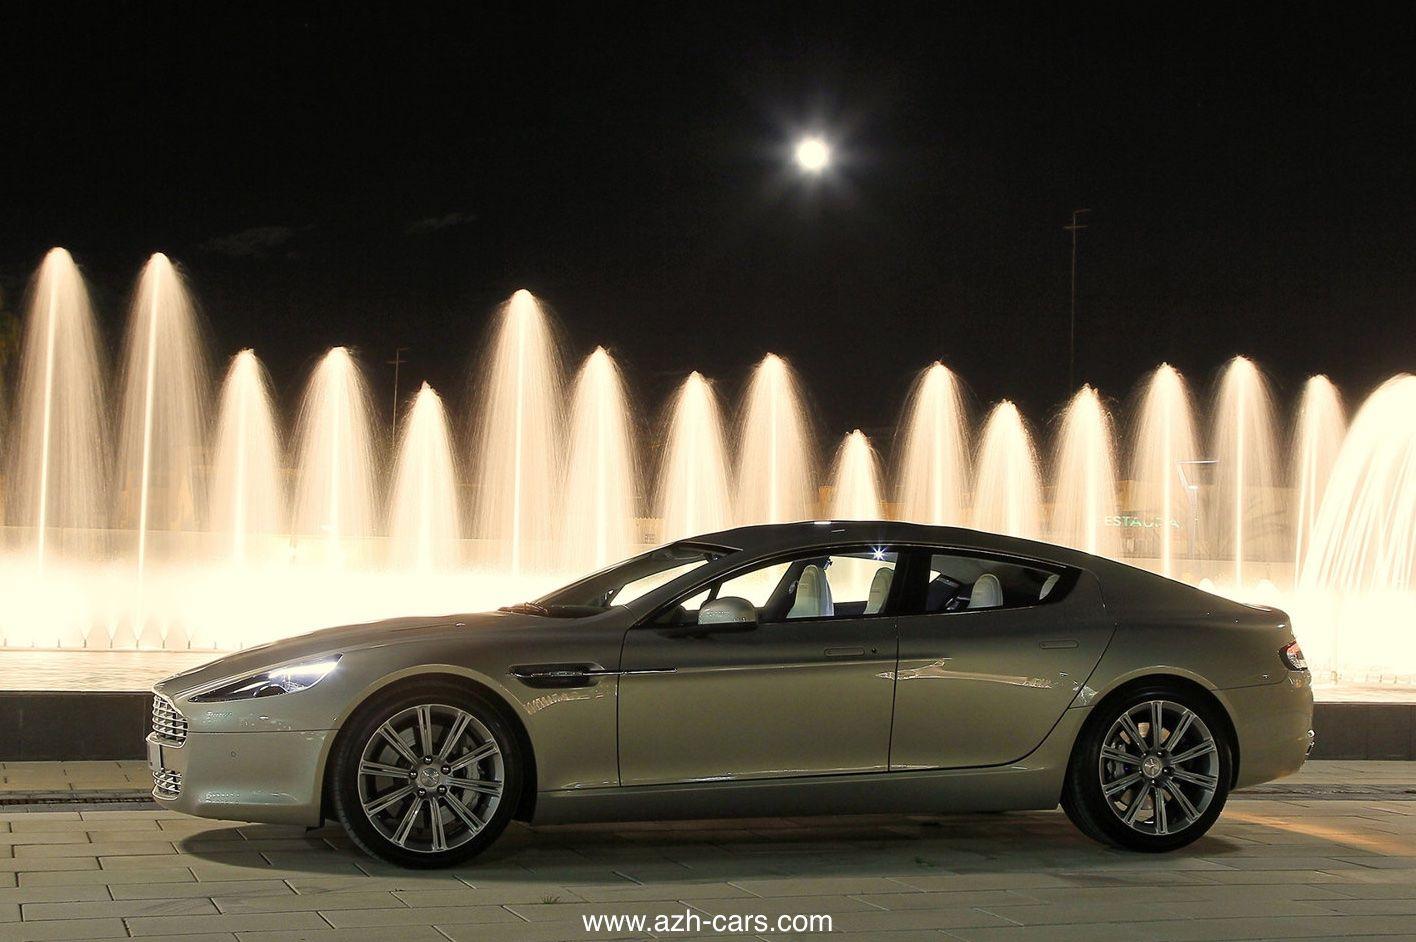 Aston Martin Rapide 2010 In 2021 Aston Martin Models Aston Martin Aston Martin Rapide